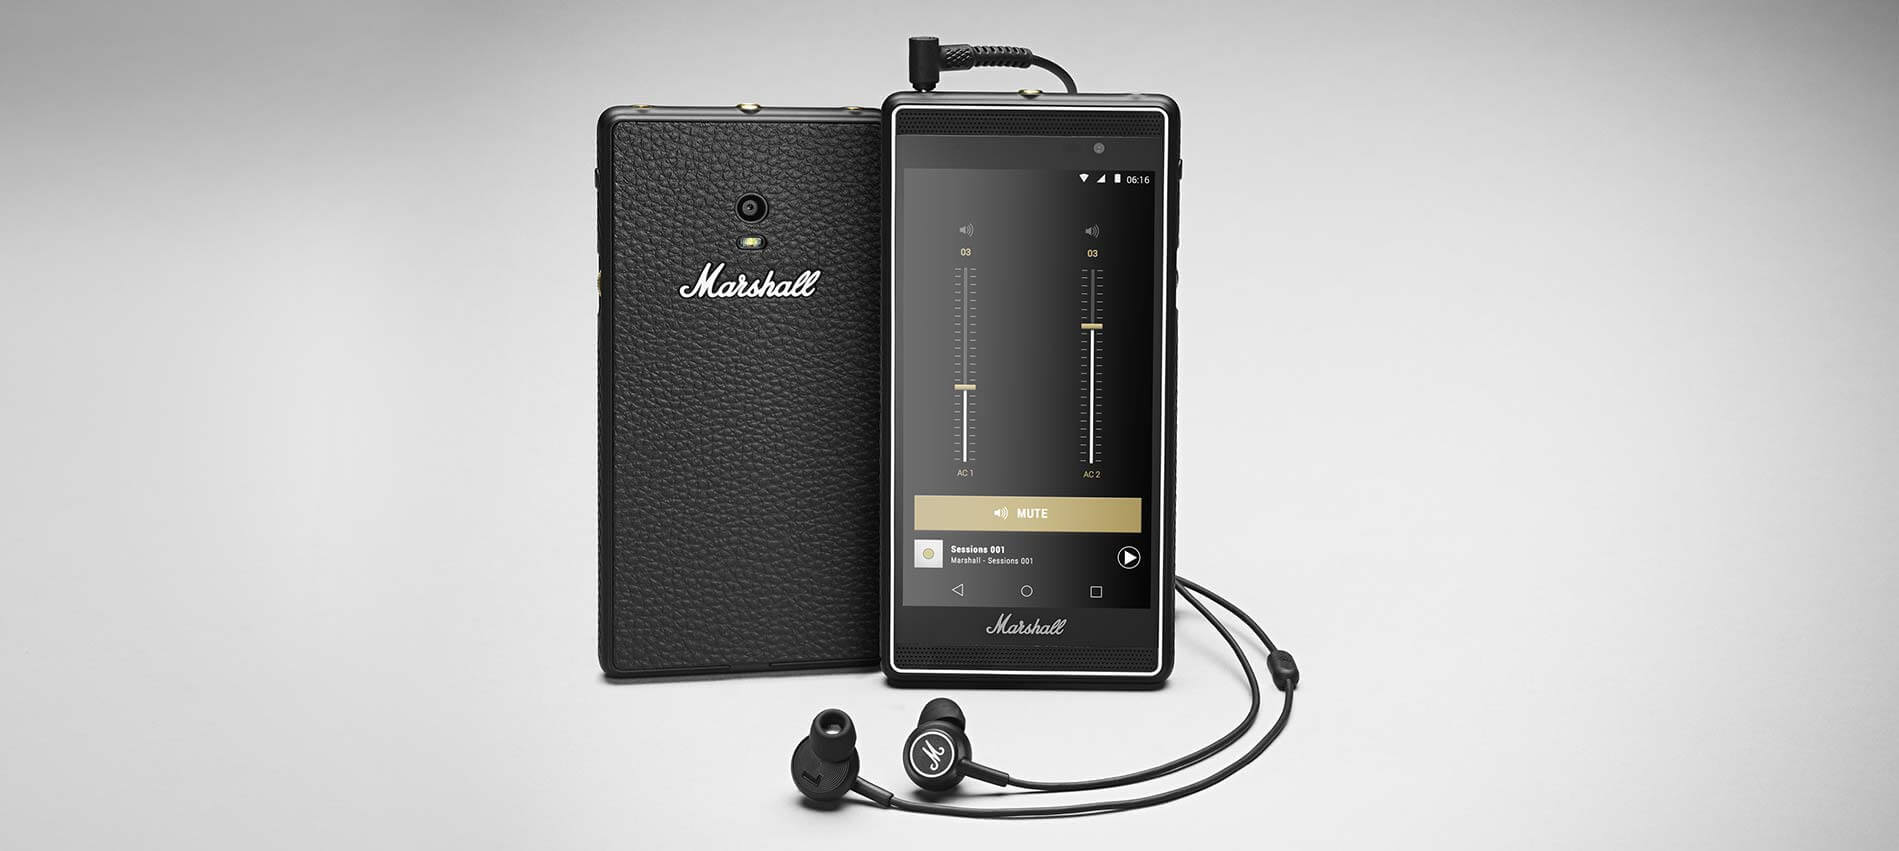 marshall london hight quality audio phone